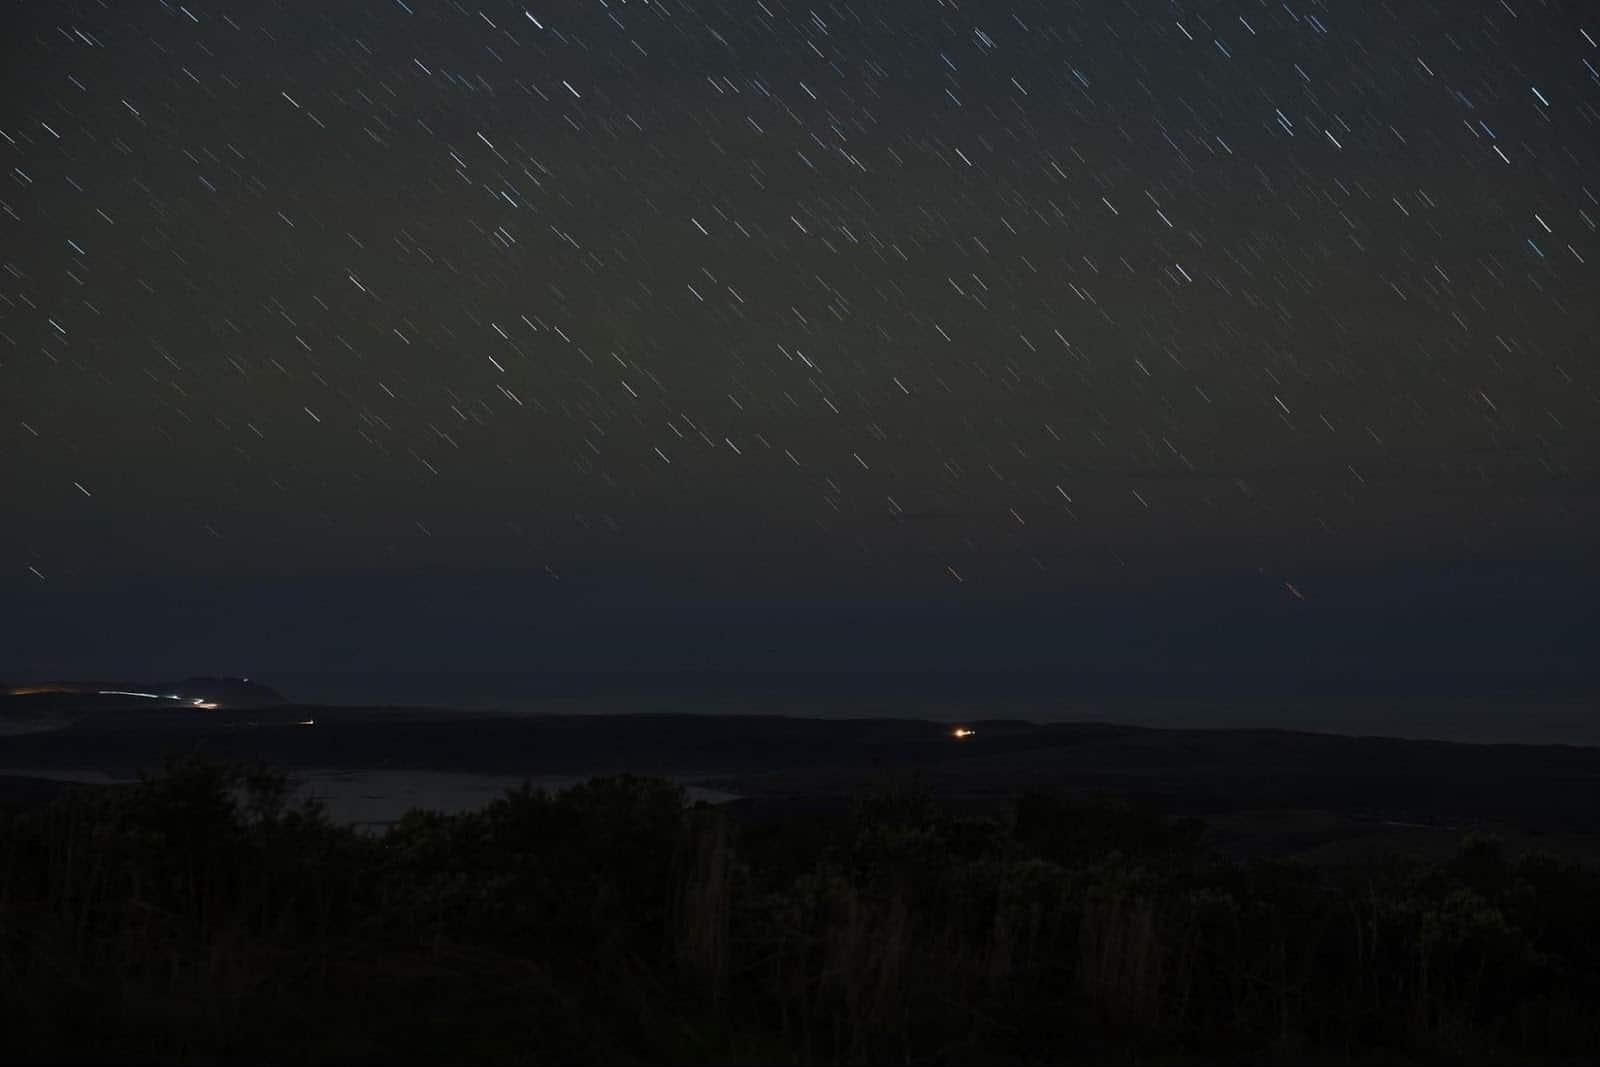 google astrophotography Scene composition 1